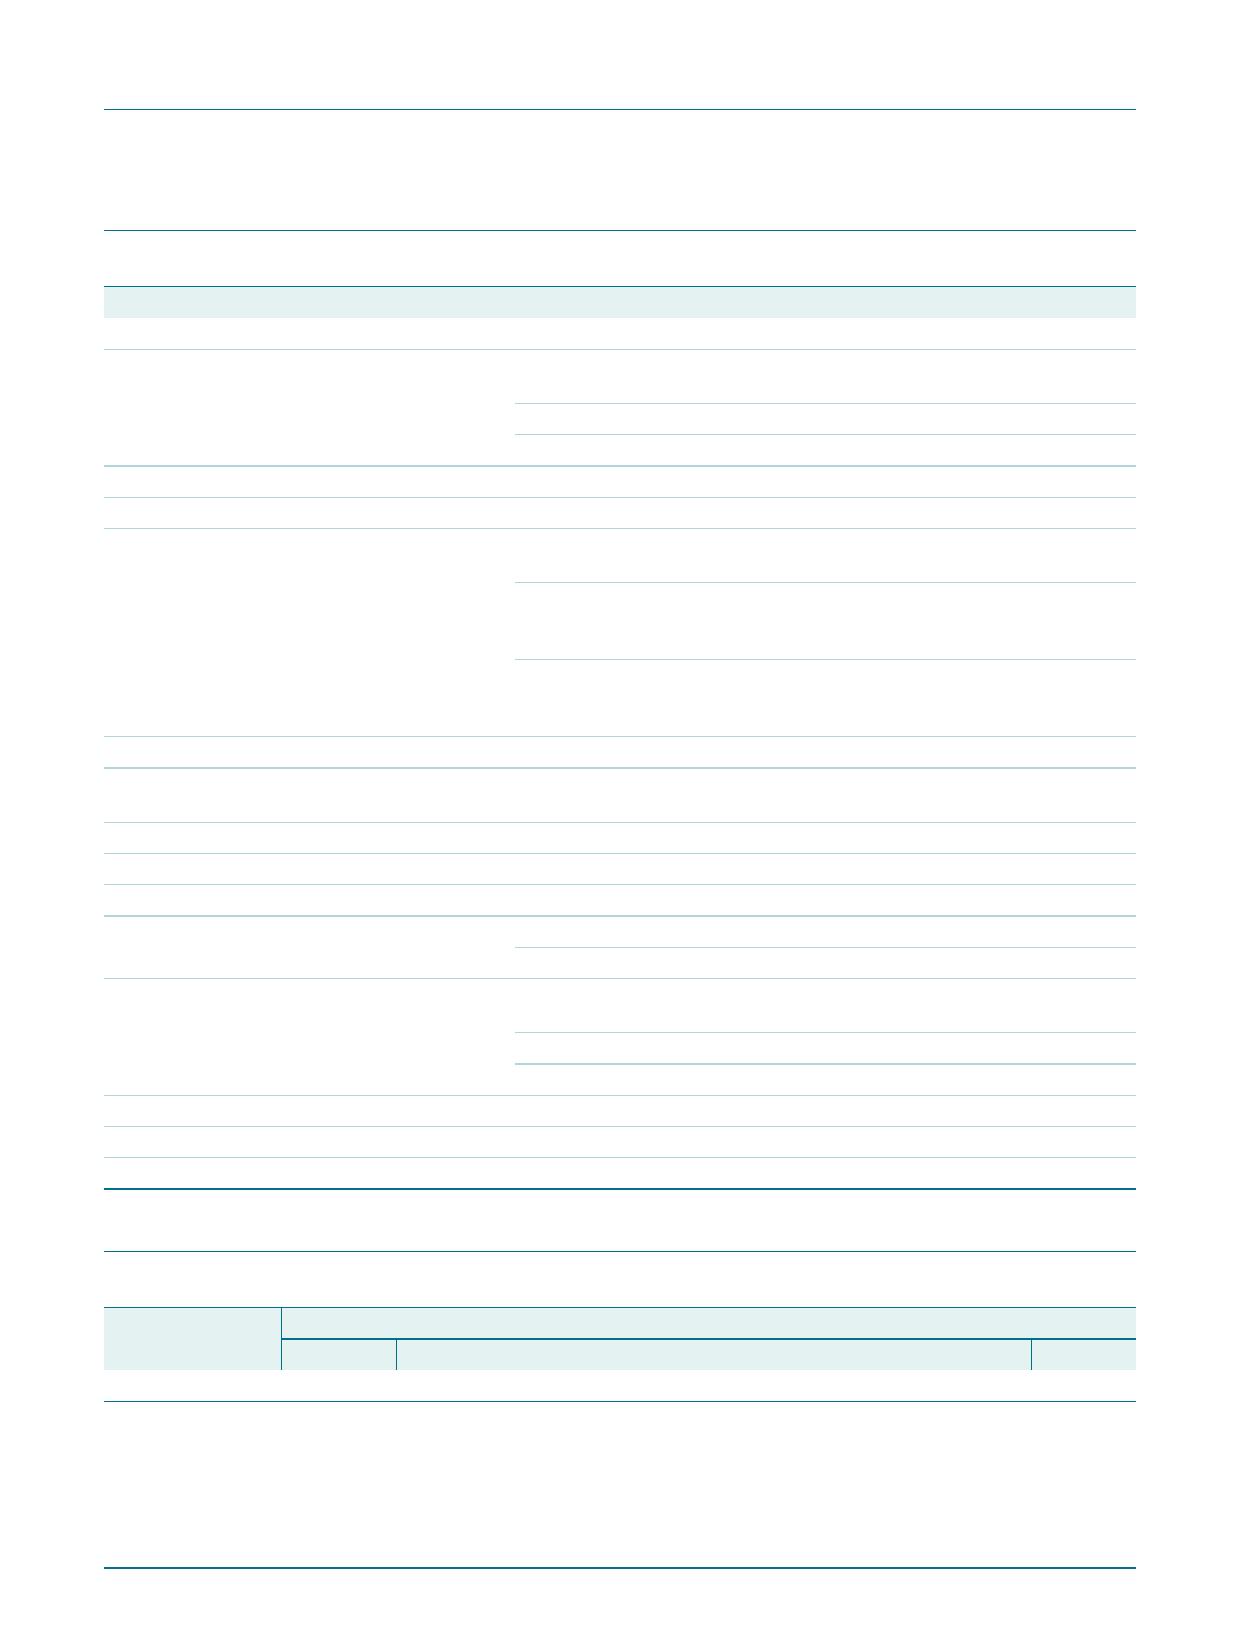 TEF6624 pdf schematic